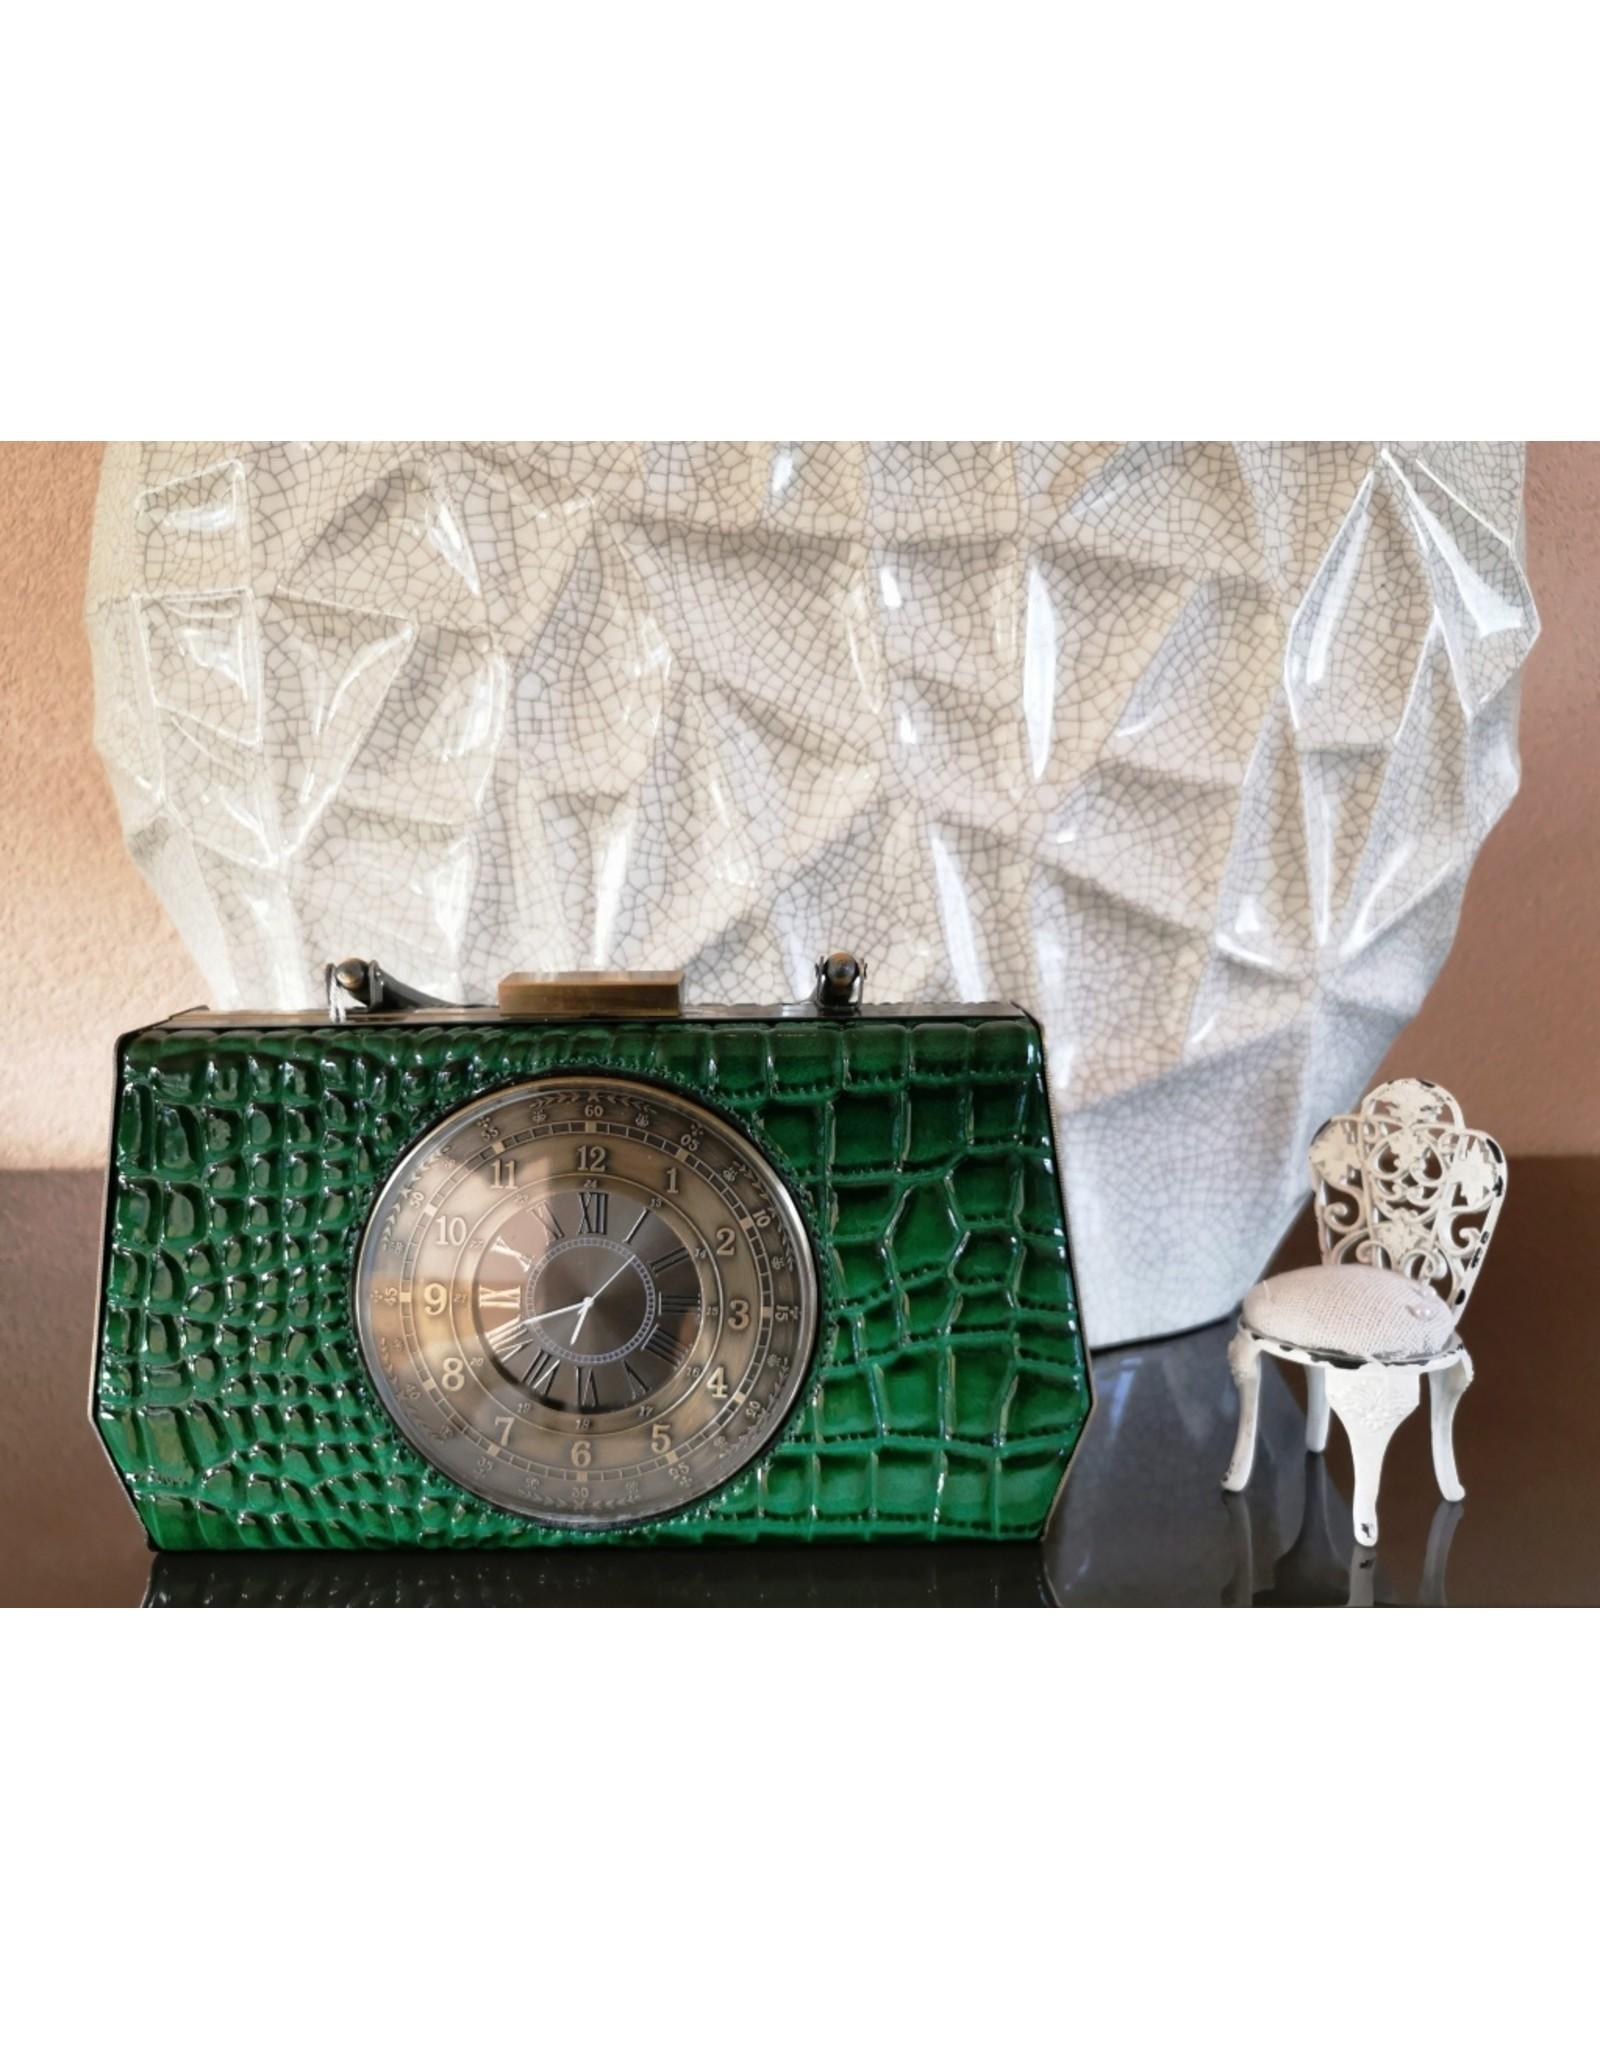 Magic Bags Retro tassen Vintage tassen - Handtas met Echte Klok vintage style groen